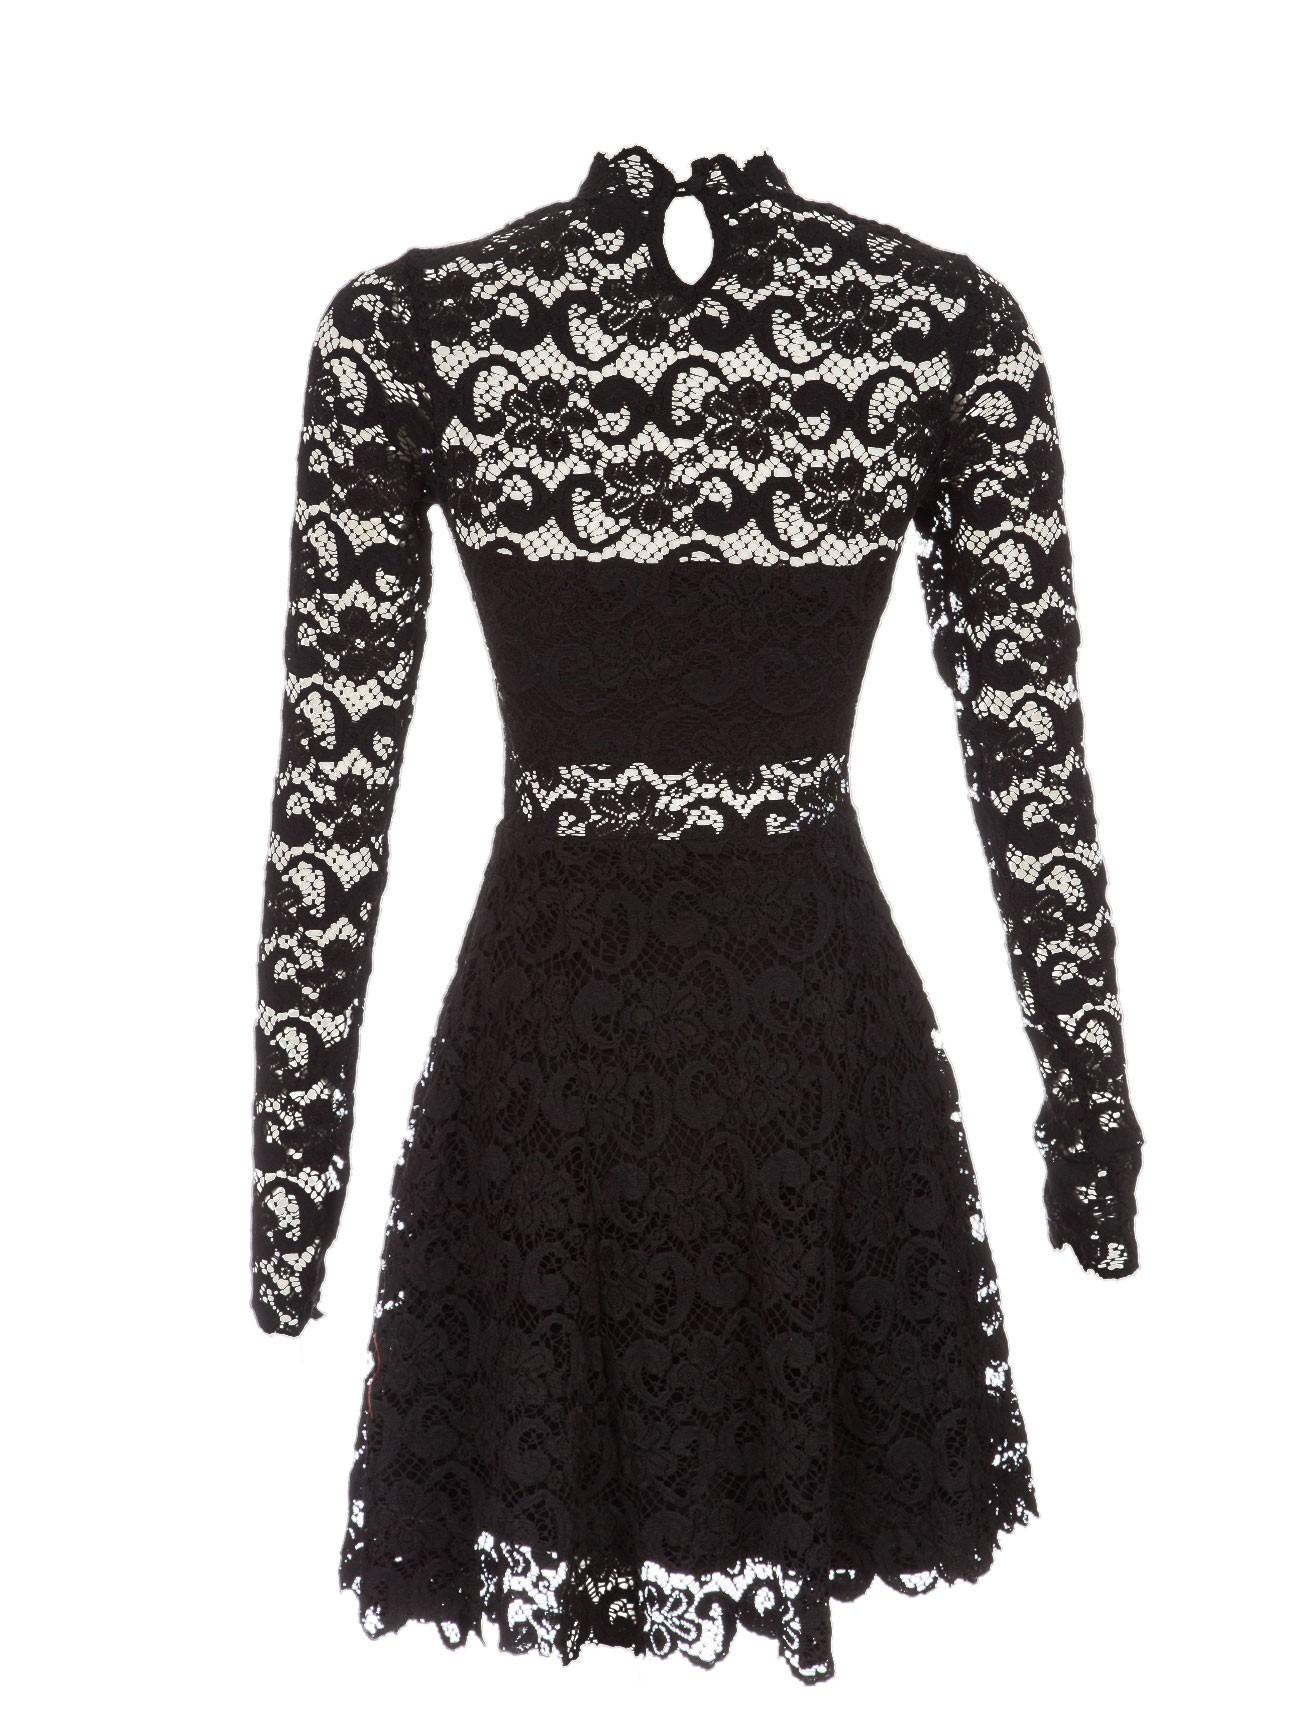 Exclusive dixie lace fit & flare dress